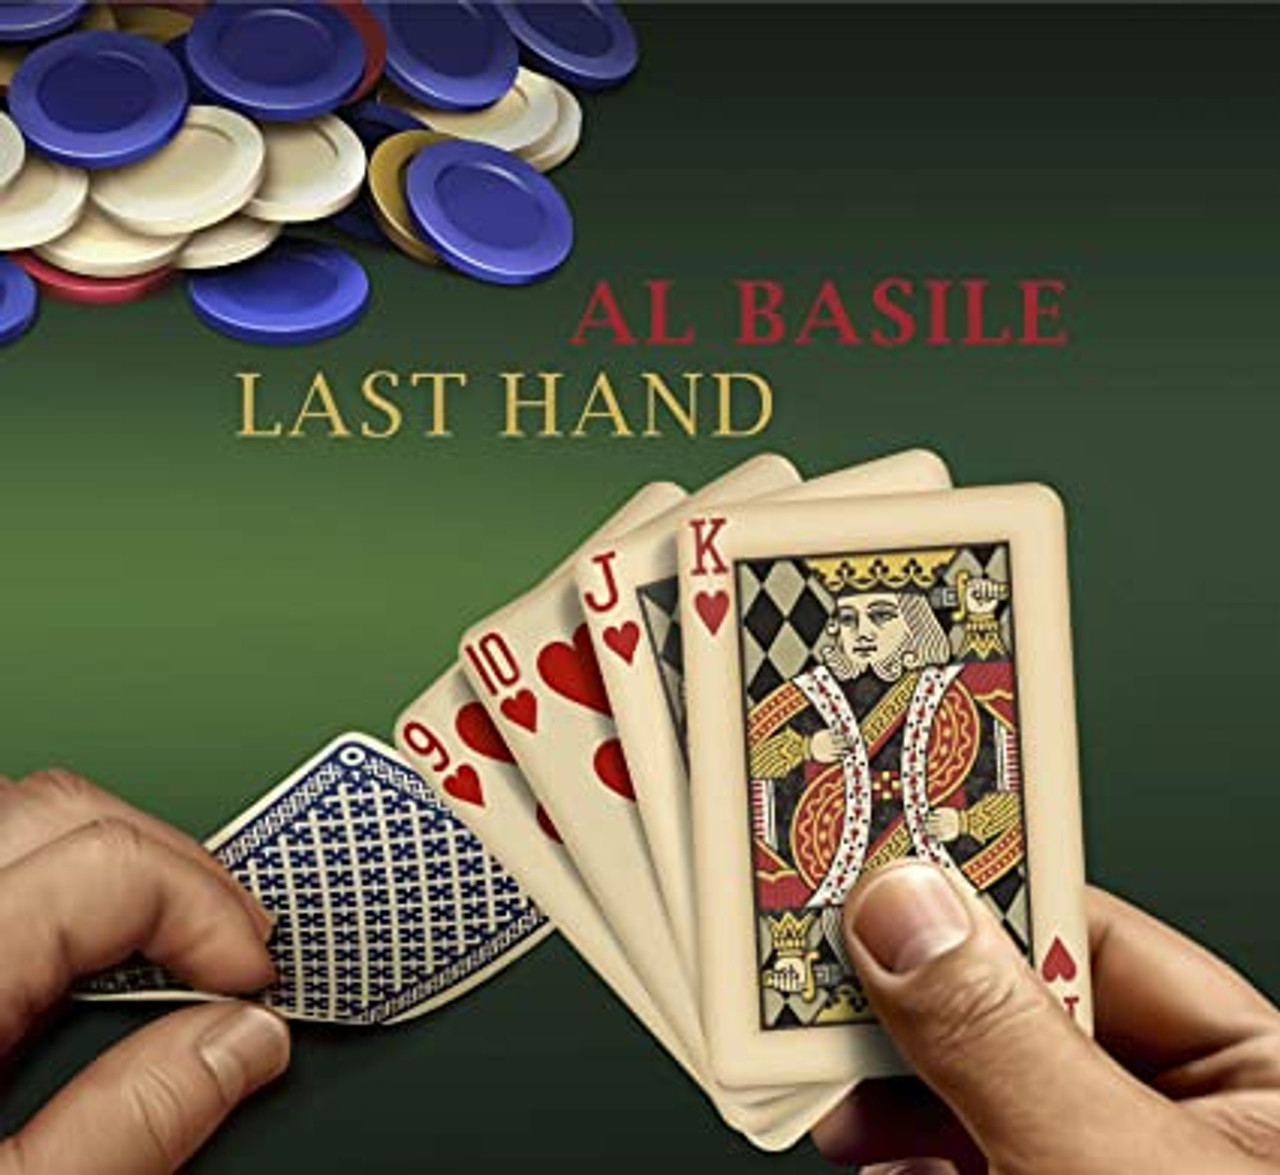 AL BASILE - LAST HAND